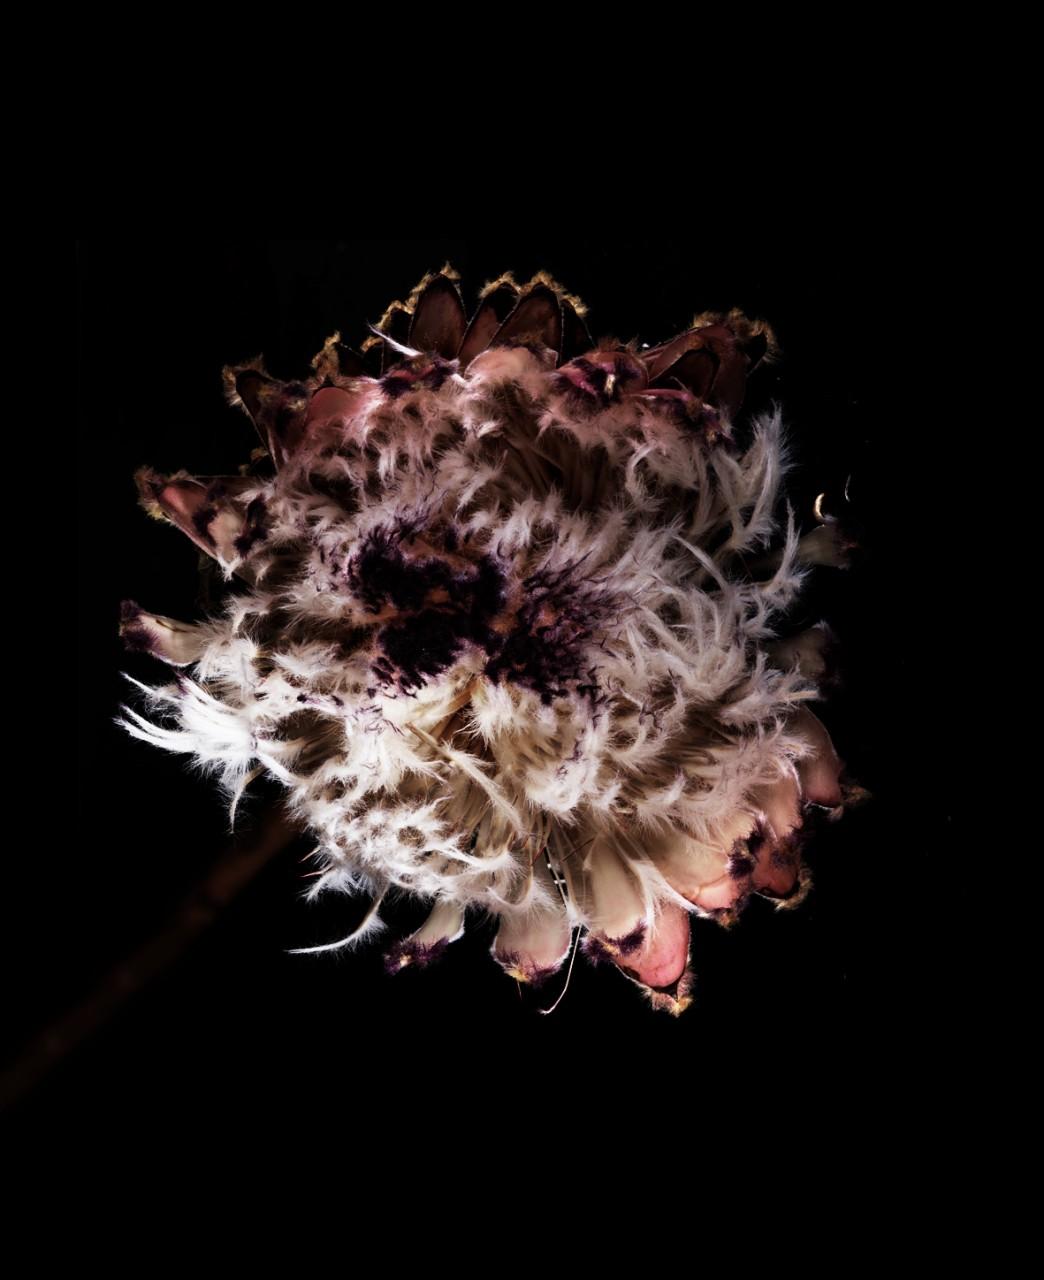 FLOWERPLUME01